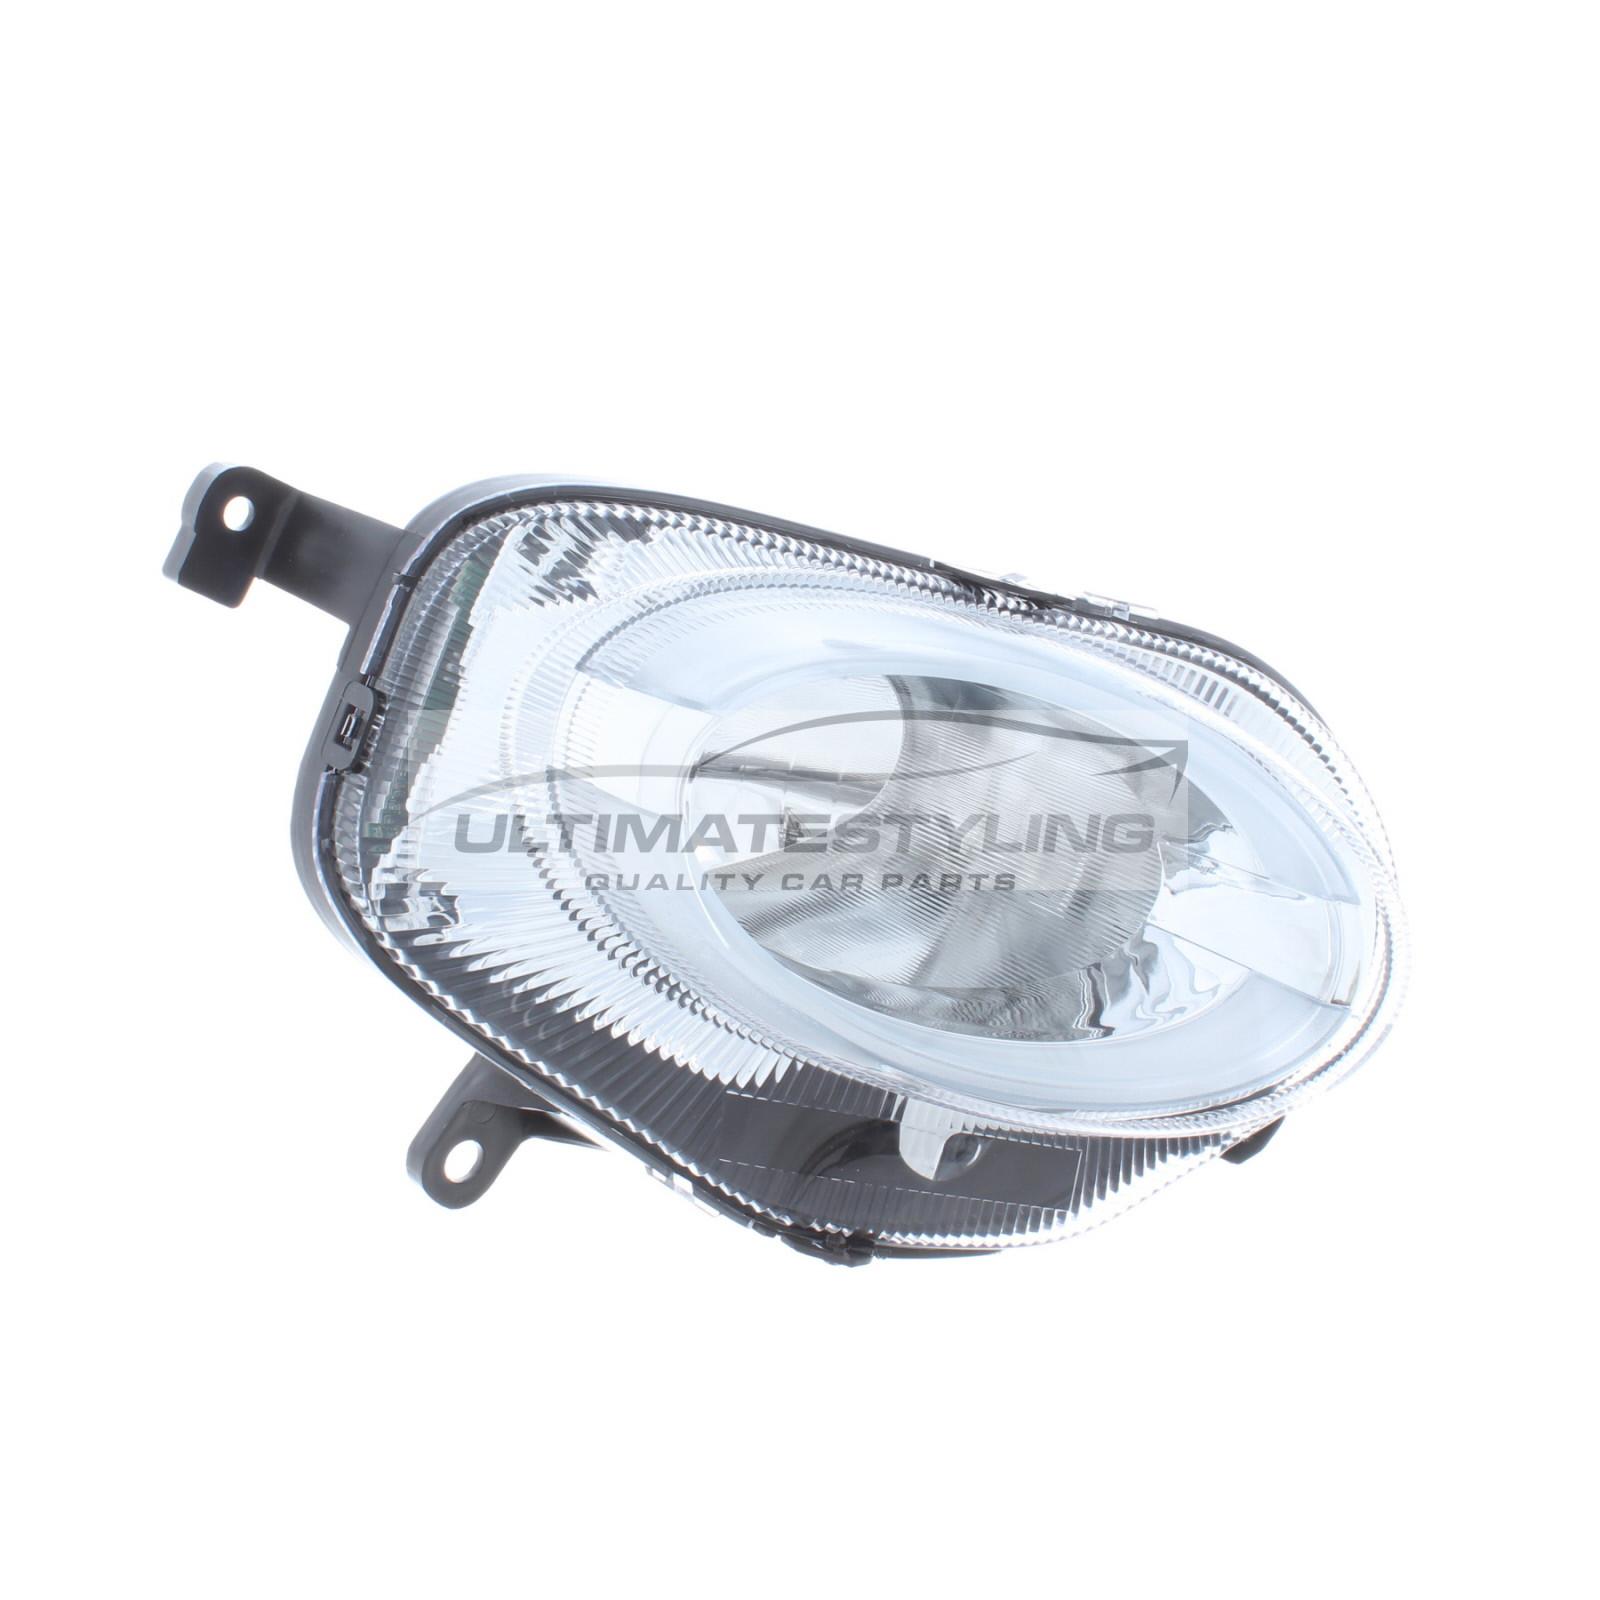 Abarth 500 / 595 / 695, Fiat 500 Headlight / Headlamp - Drivers Side (RH) - Halogen With LED Daytime Running Lamp